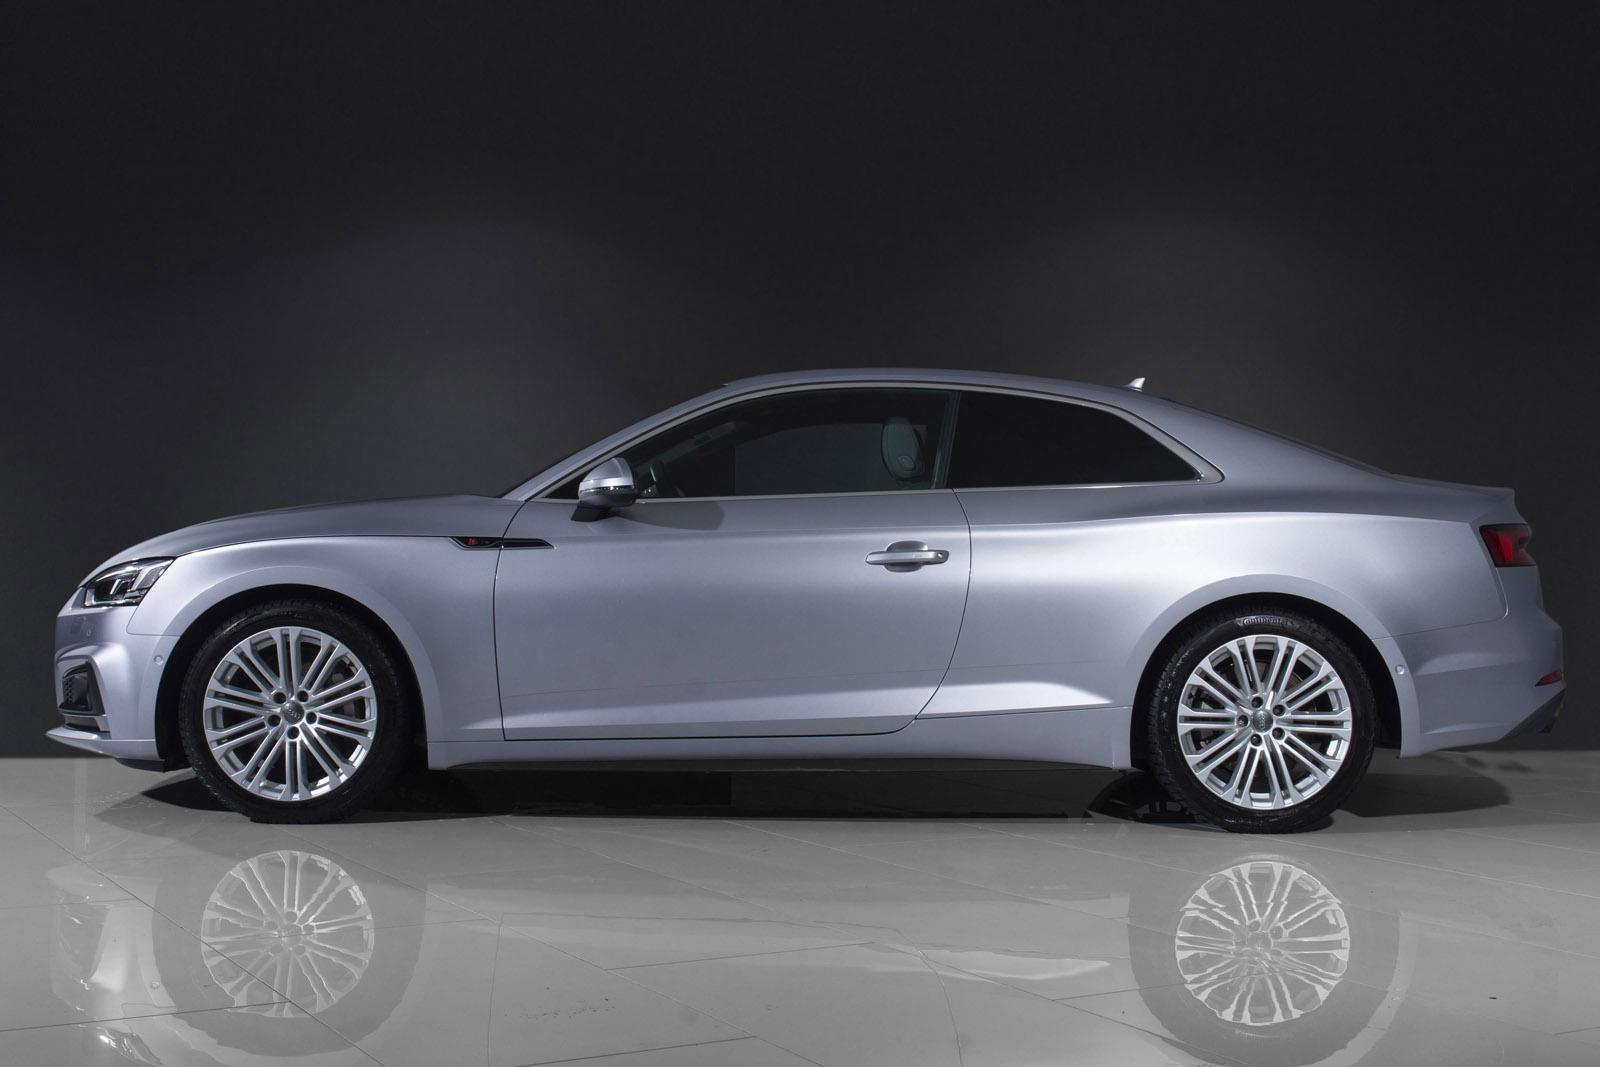 Audi_A5_06-2.jpg